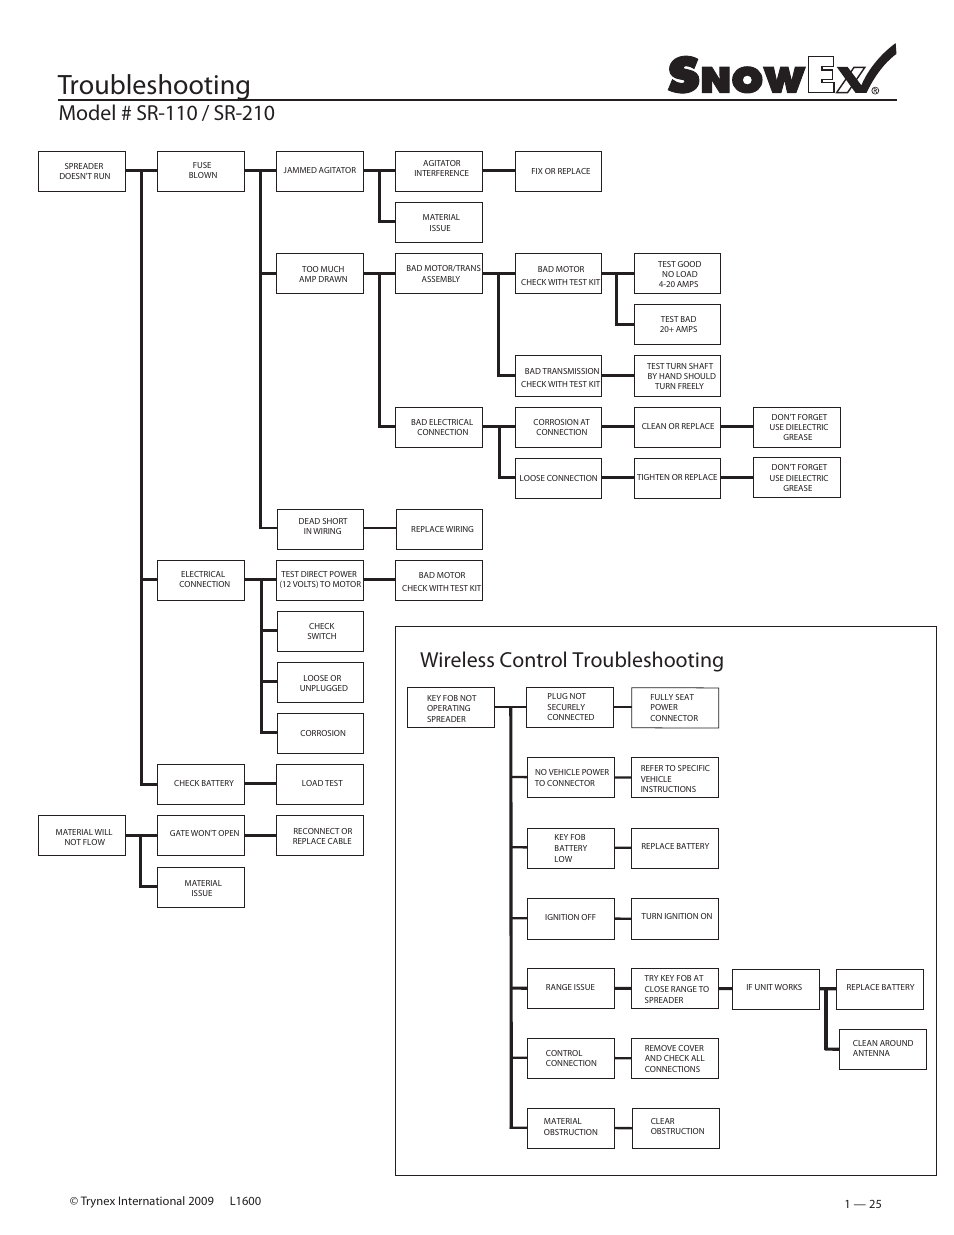 hight resolution of troubleshooting wireless control troubleshooting snowex sr 210 rh manualsdir com snowex sr110 wiring diagram